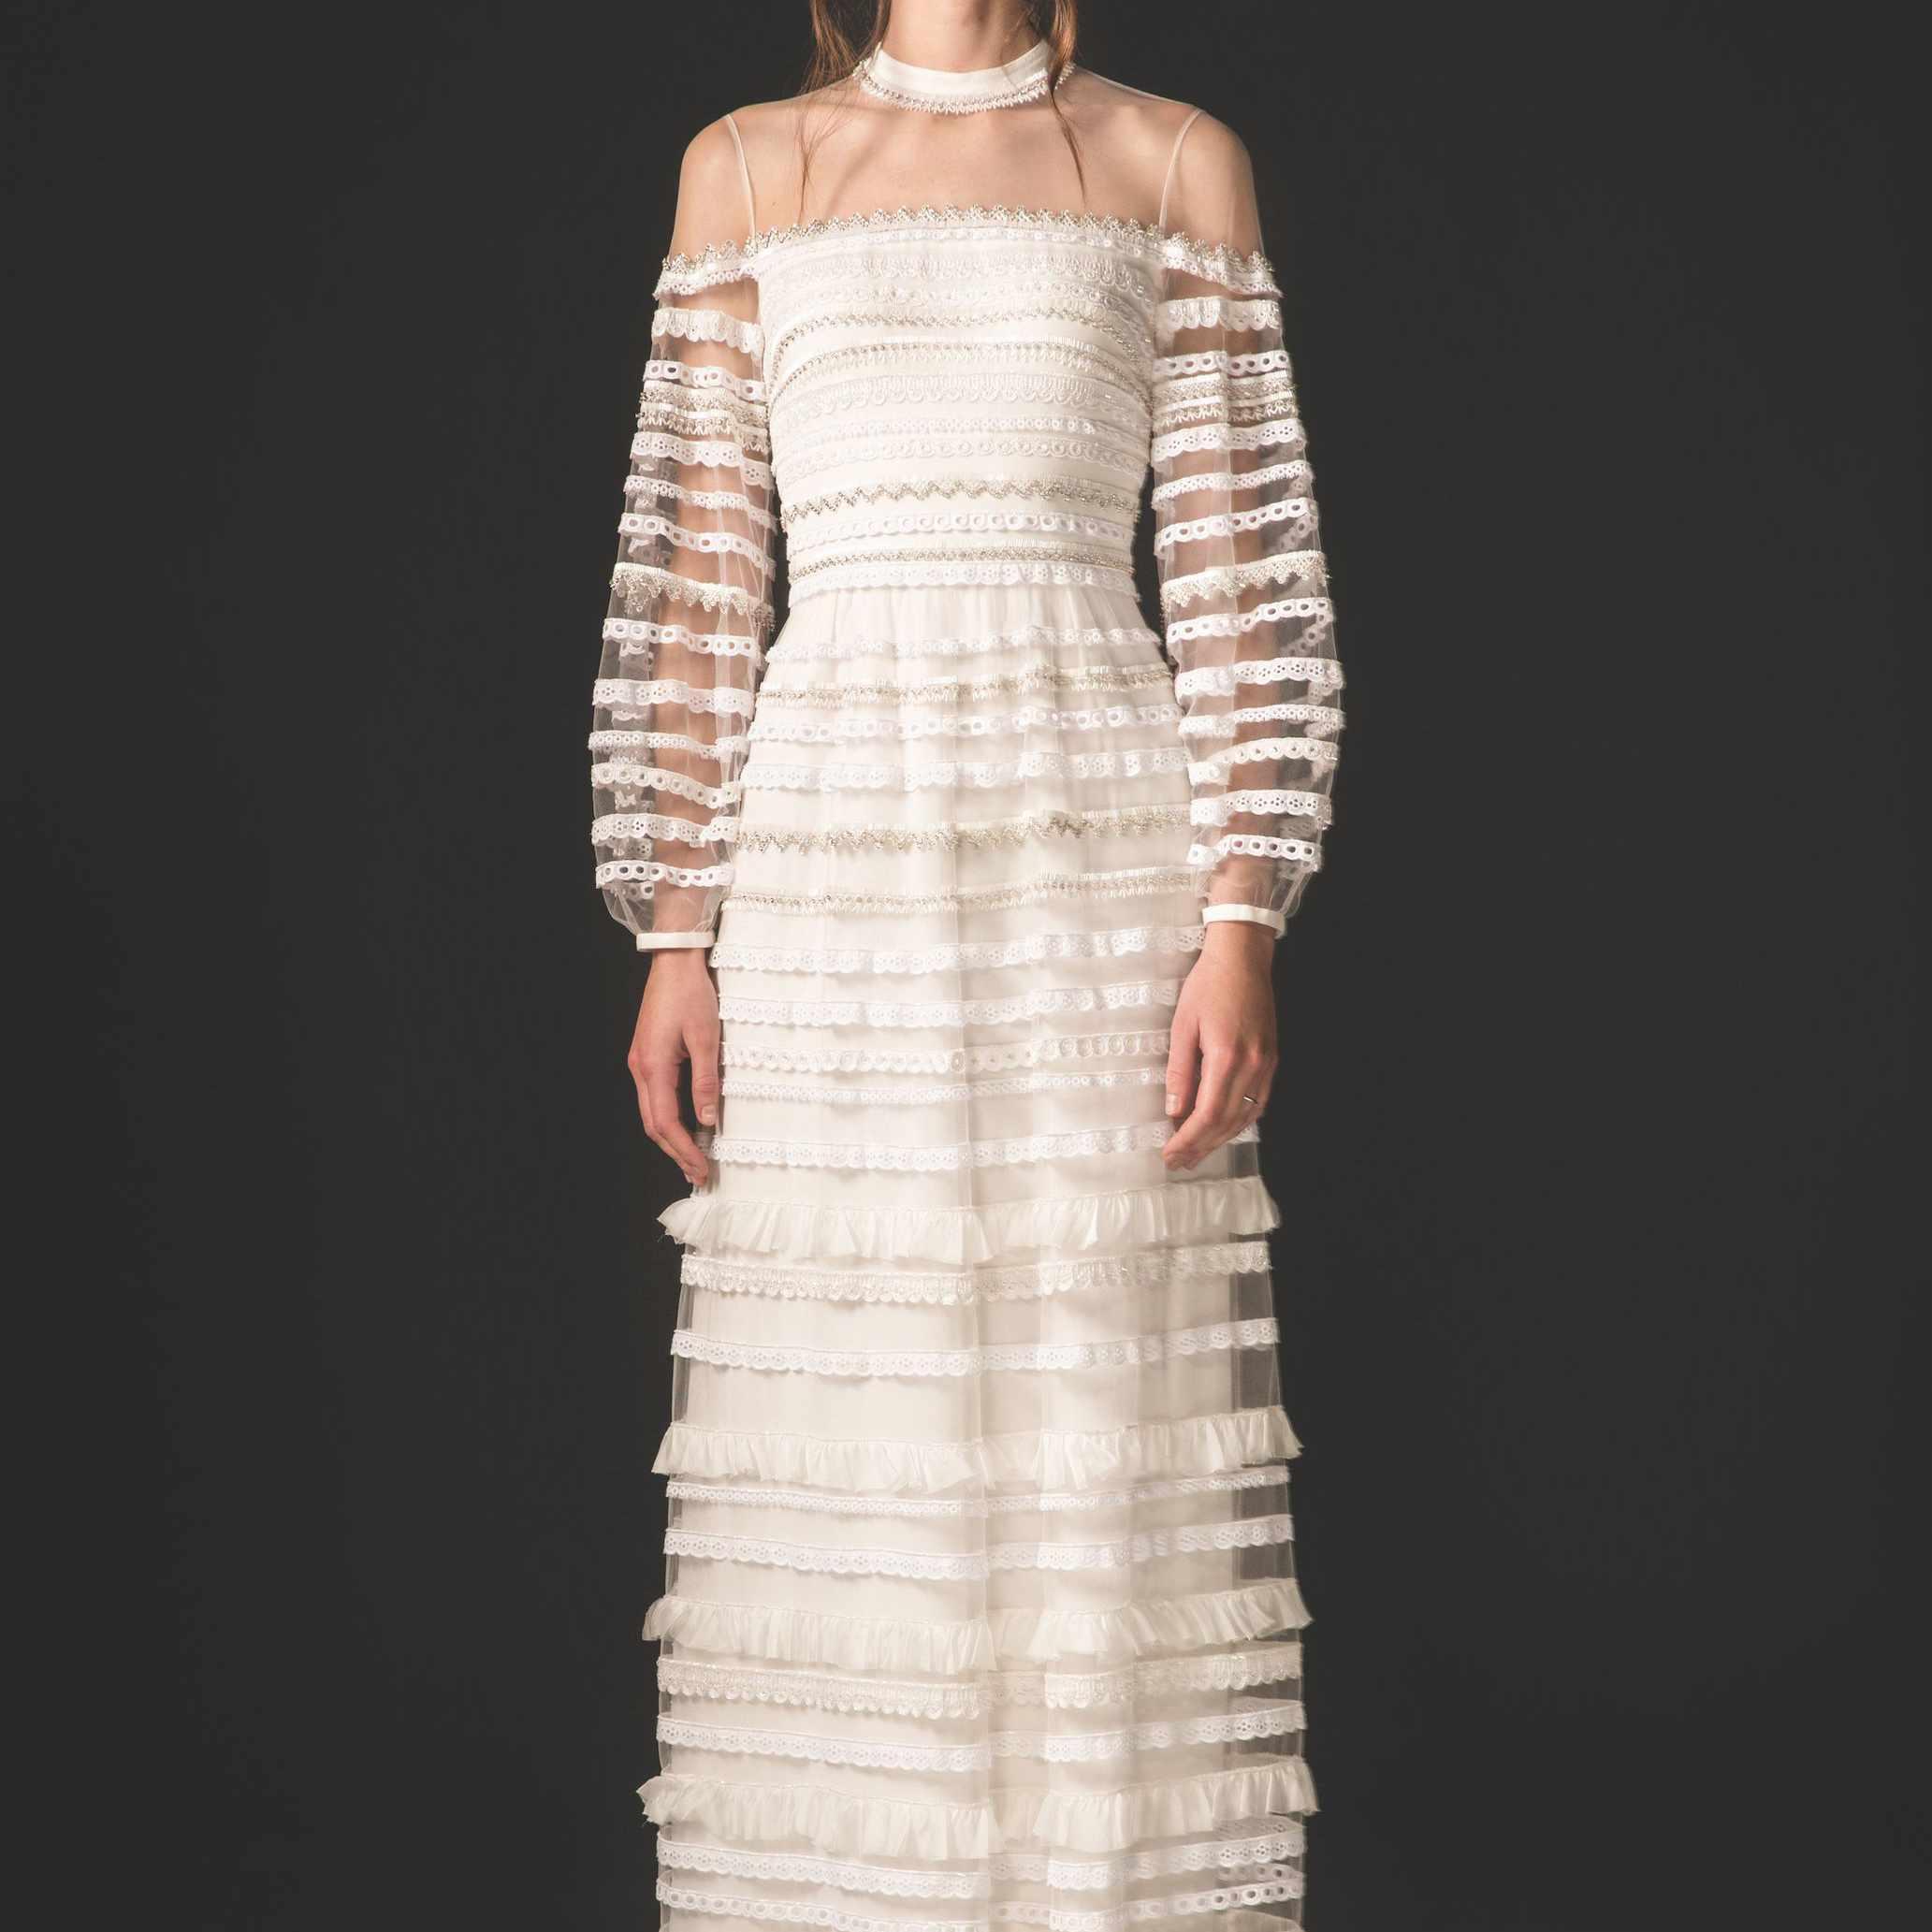 Model in long-sleeved embellished tulle ruffle dress